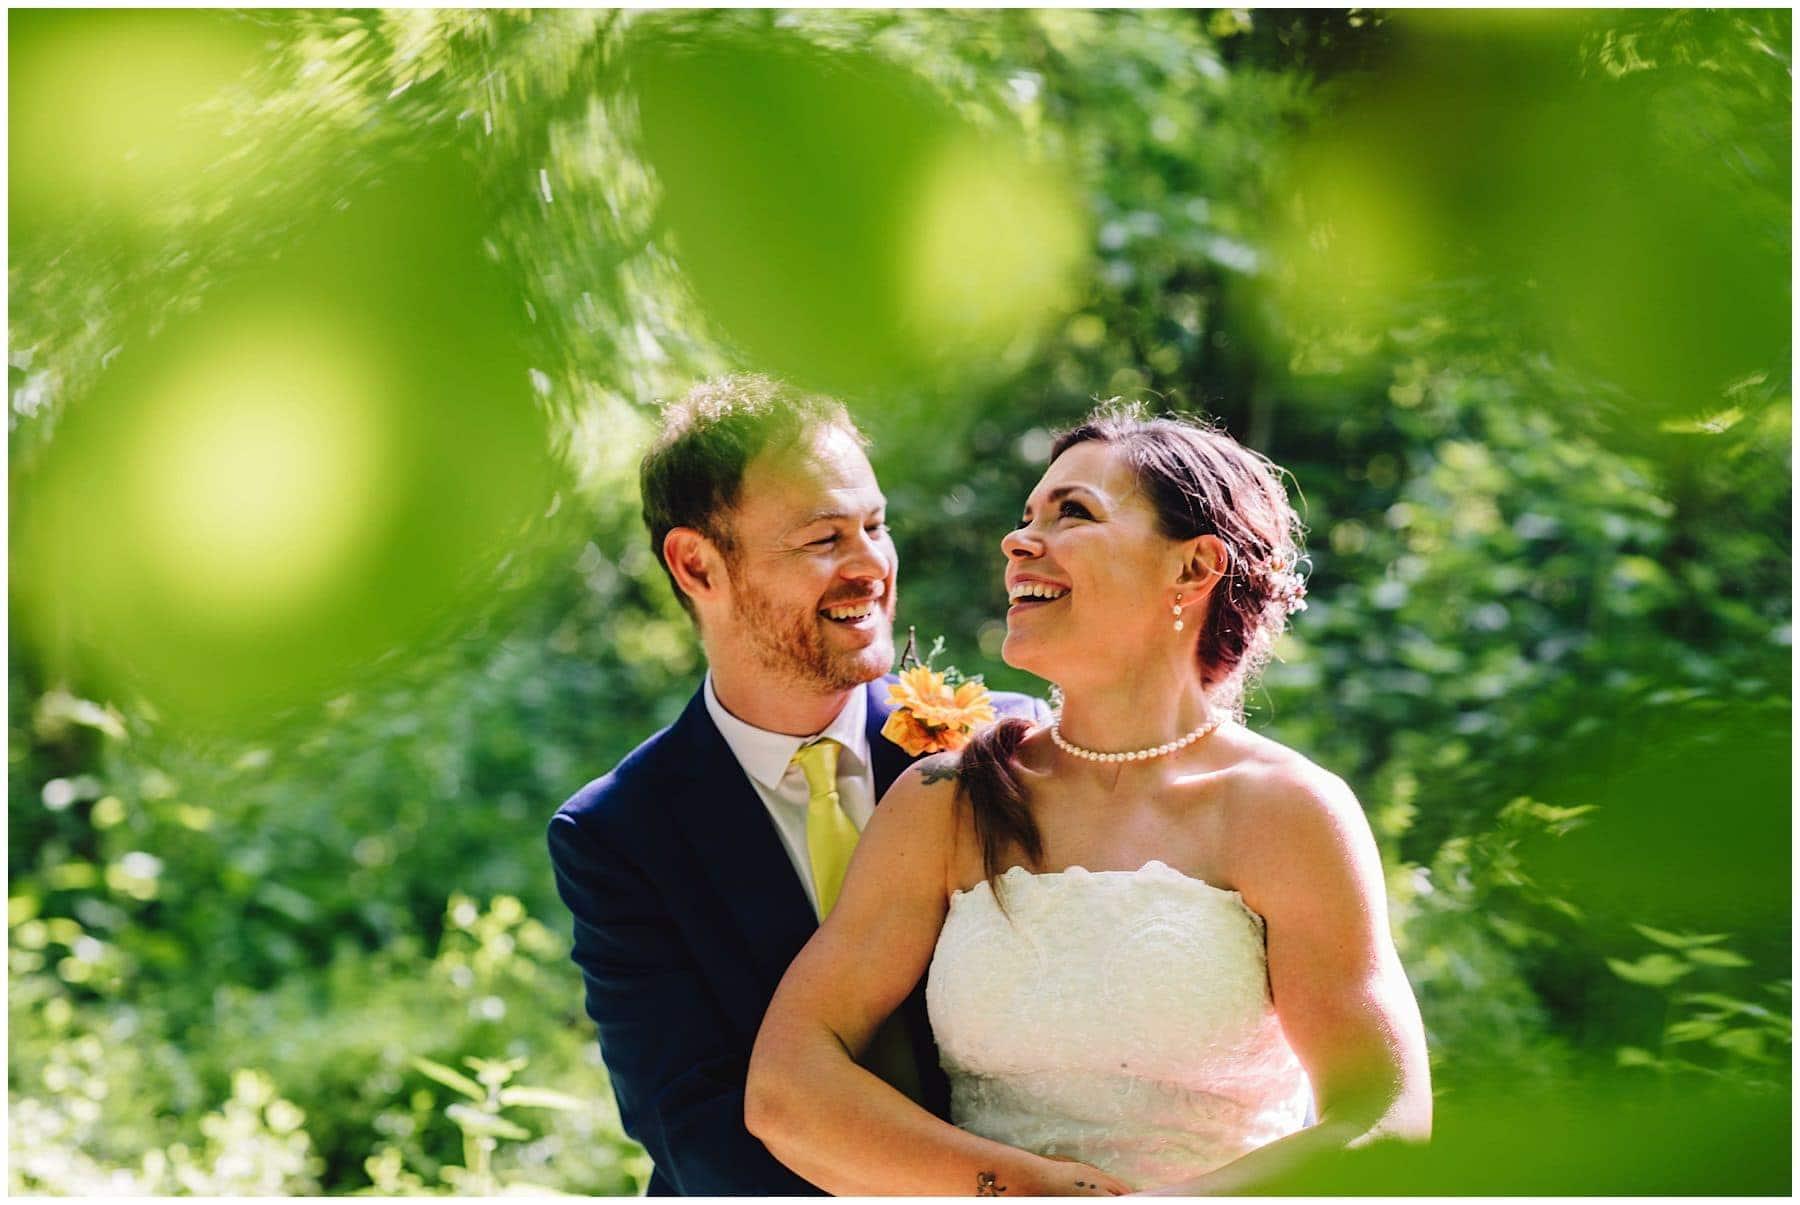 Hothorp Hall Woodlands Wedding Photographer 30